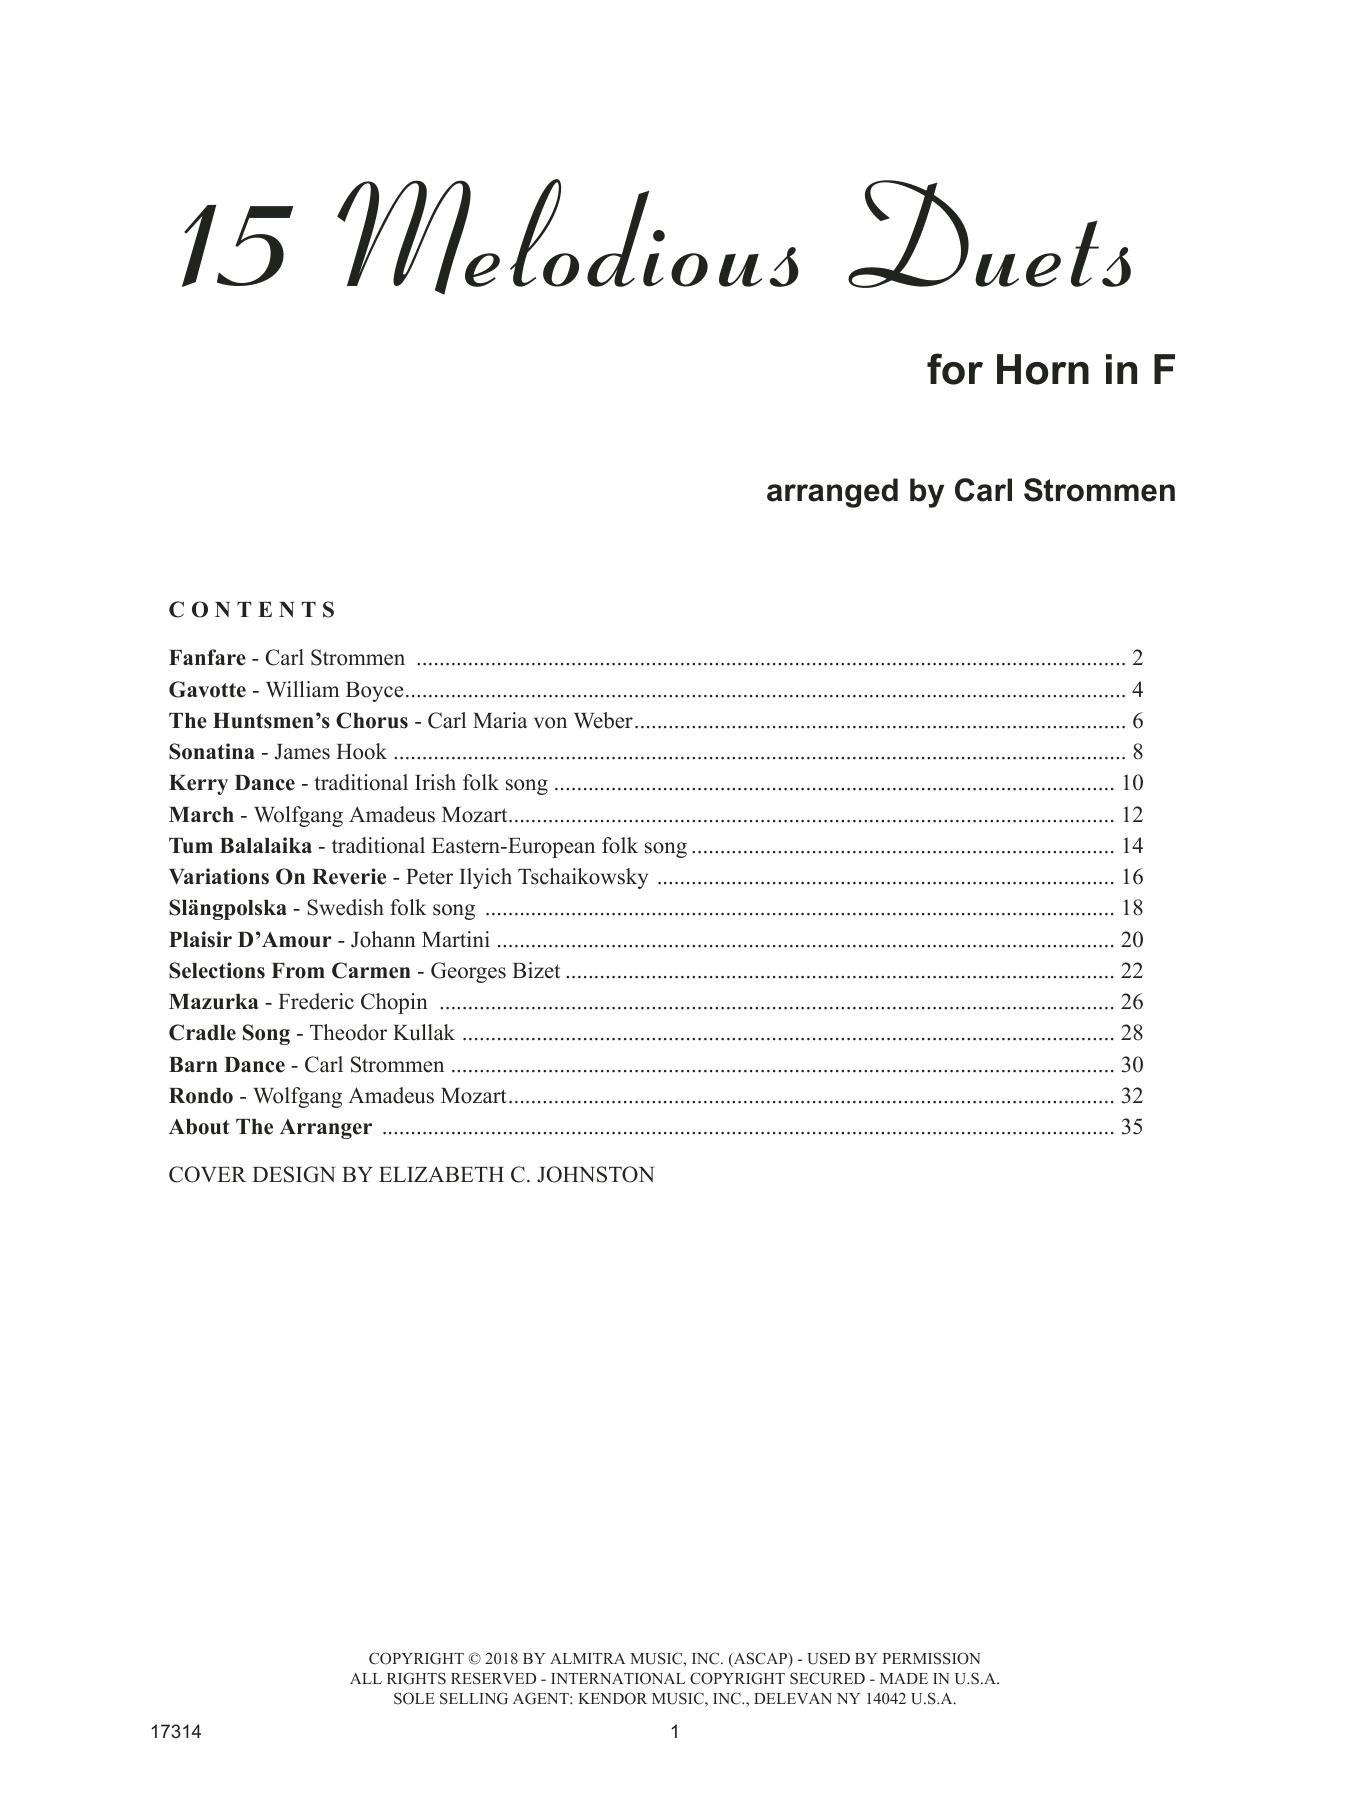 15 Melodious Duets (Brass Ensemble)